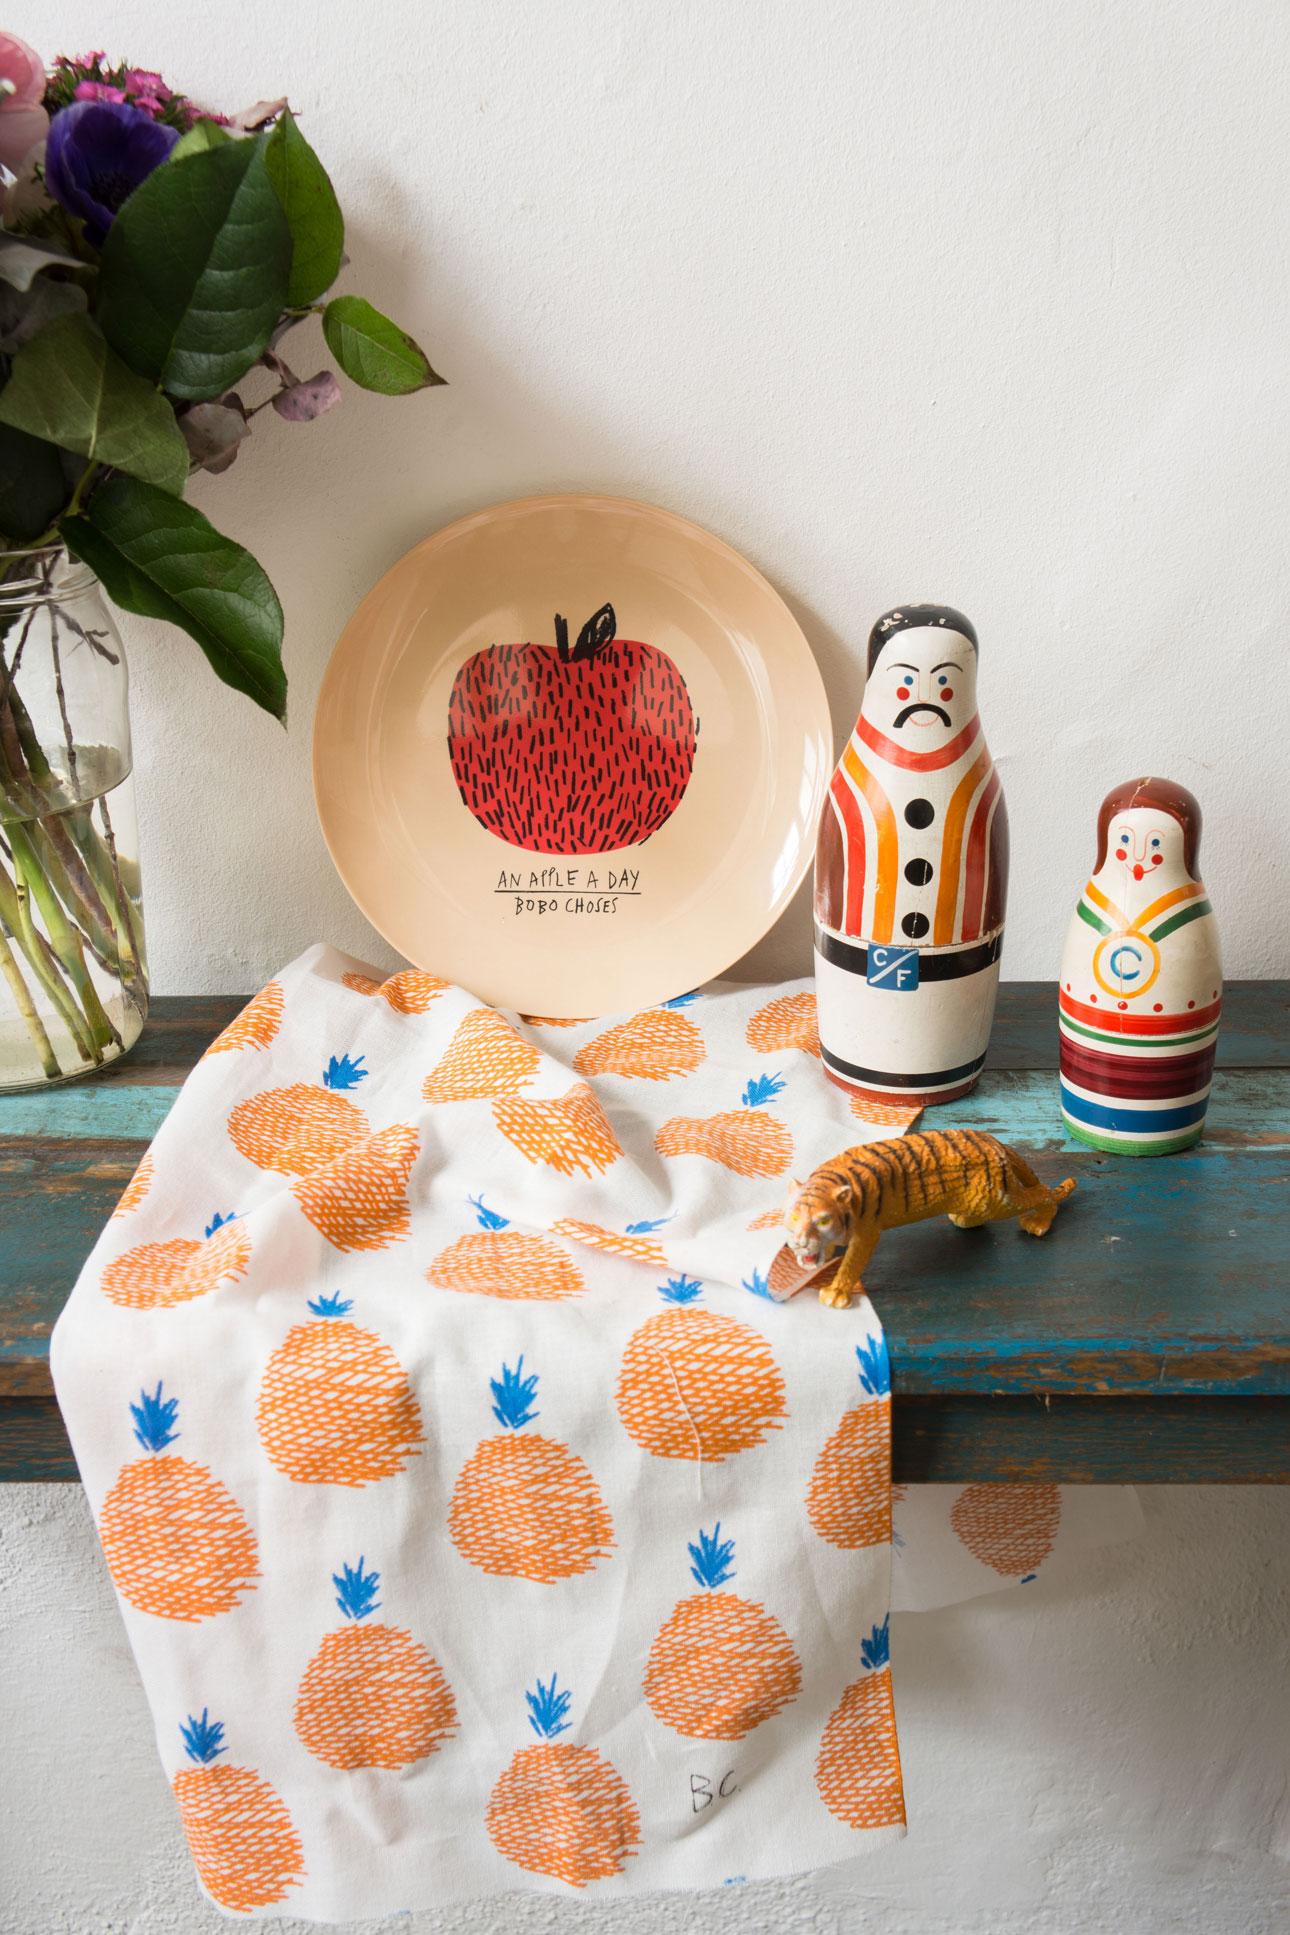 Bobo Choses maison wooncollectie - bord appel, theedoek sinaasappel